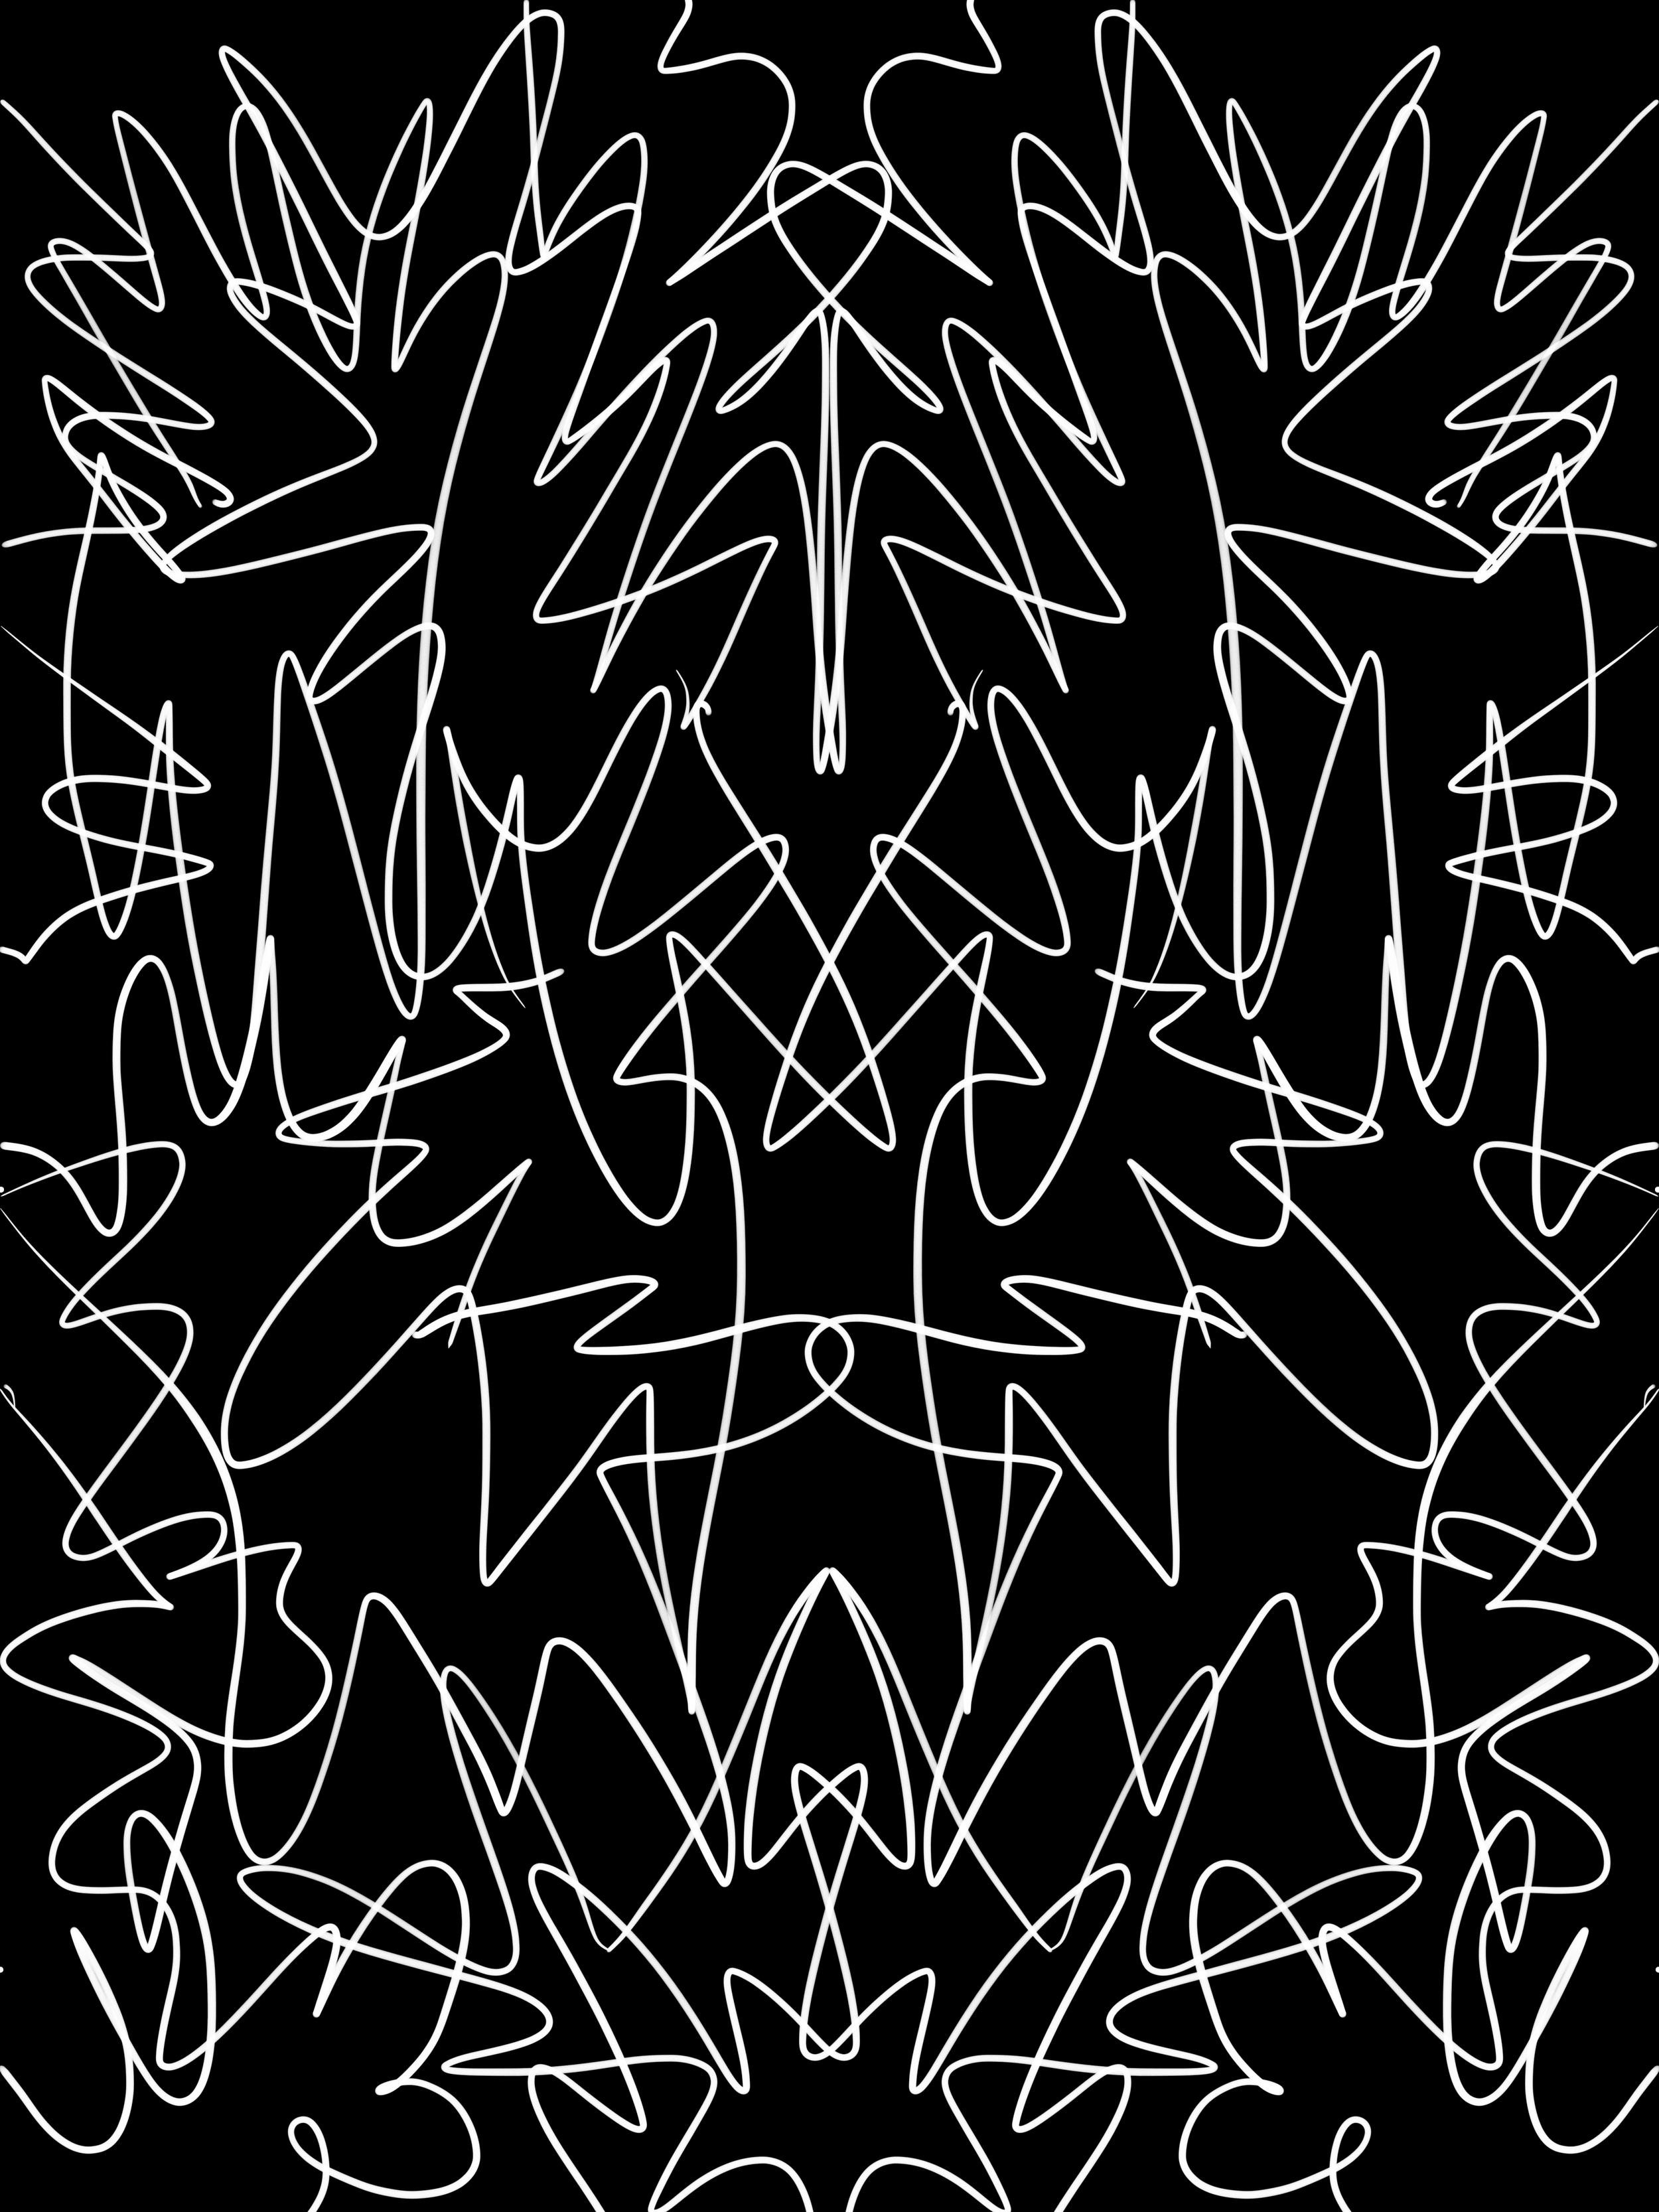 Rorschach 3